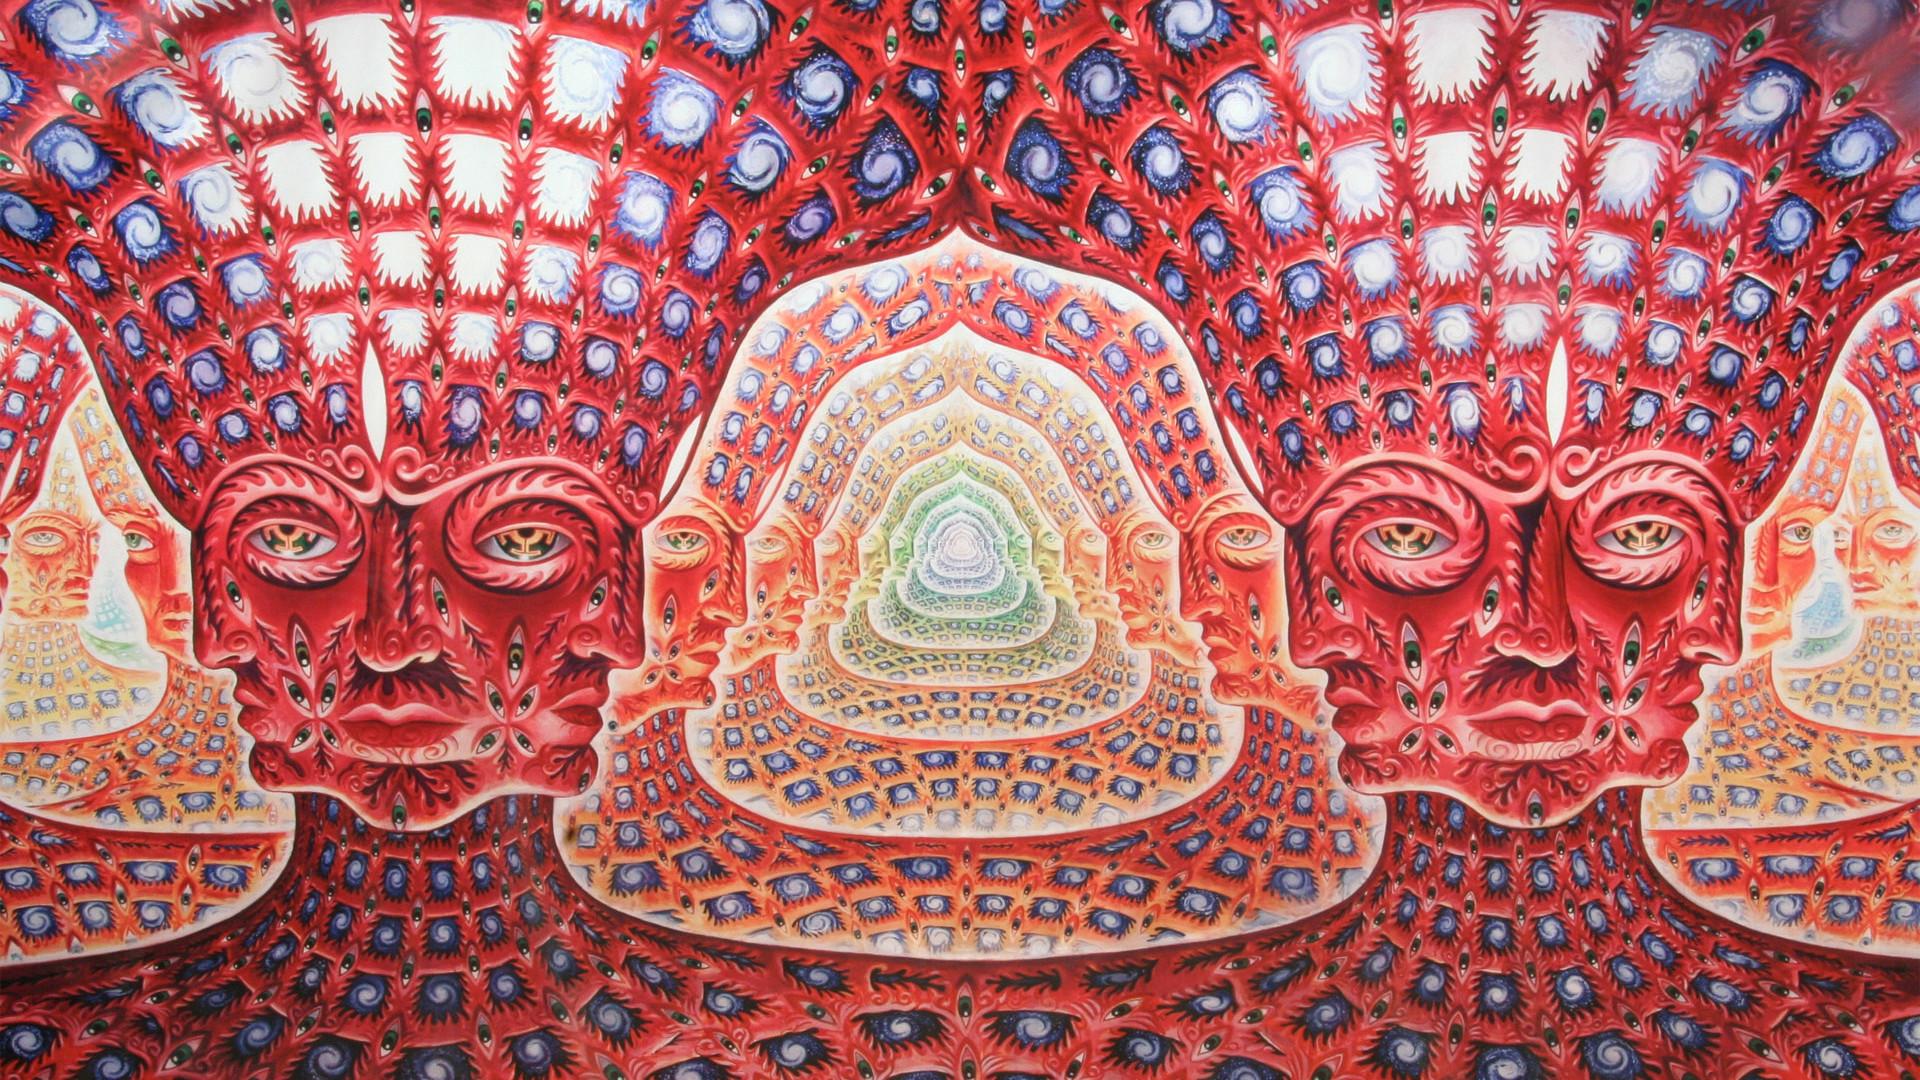 Psychedelic Desktop Wallpaper – www.wallpapers-in-hd.com